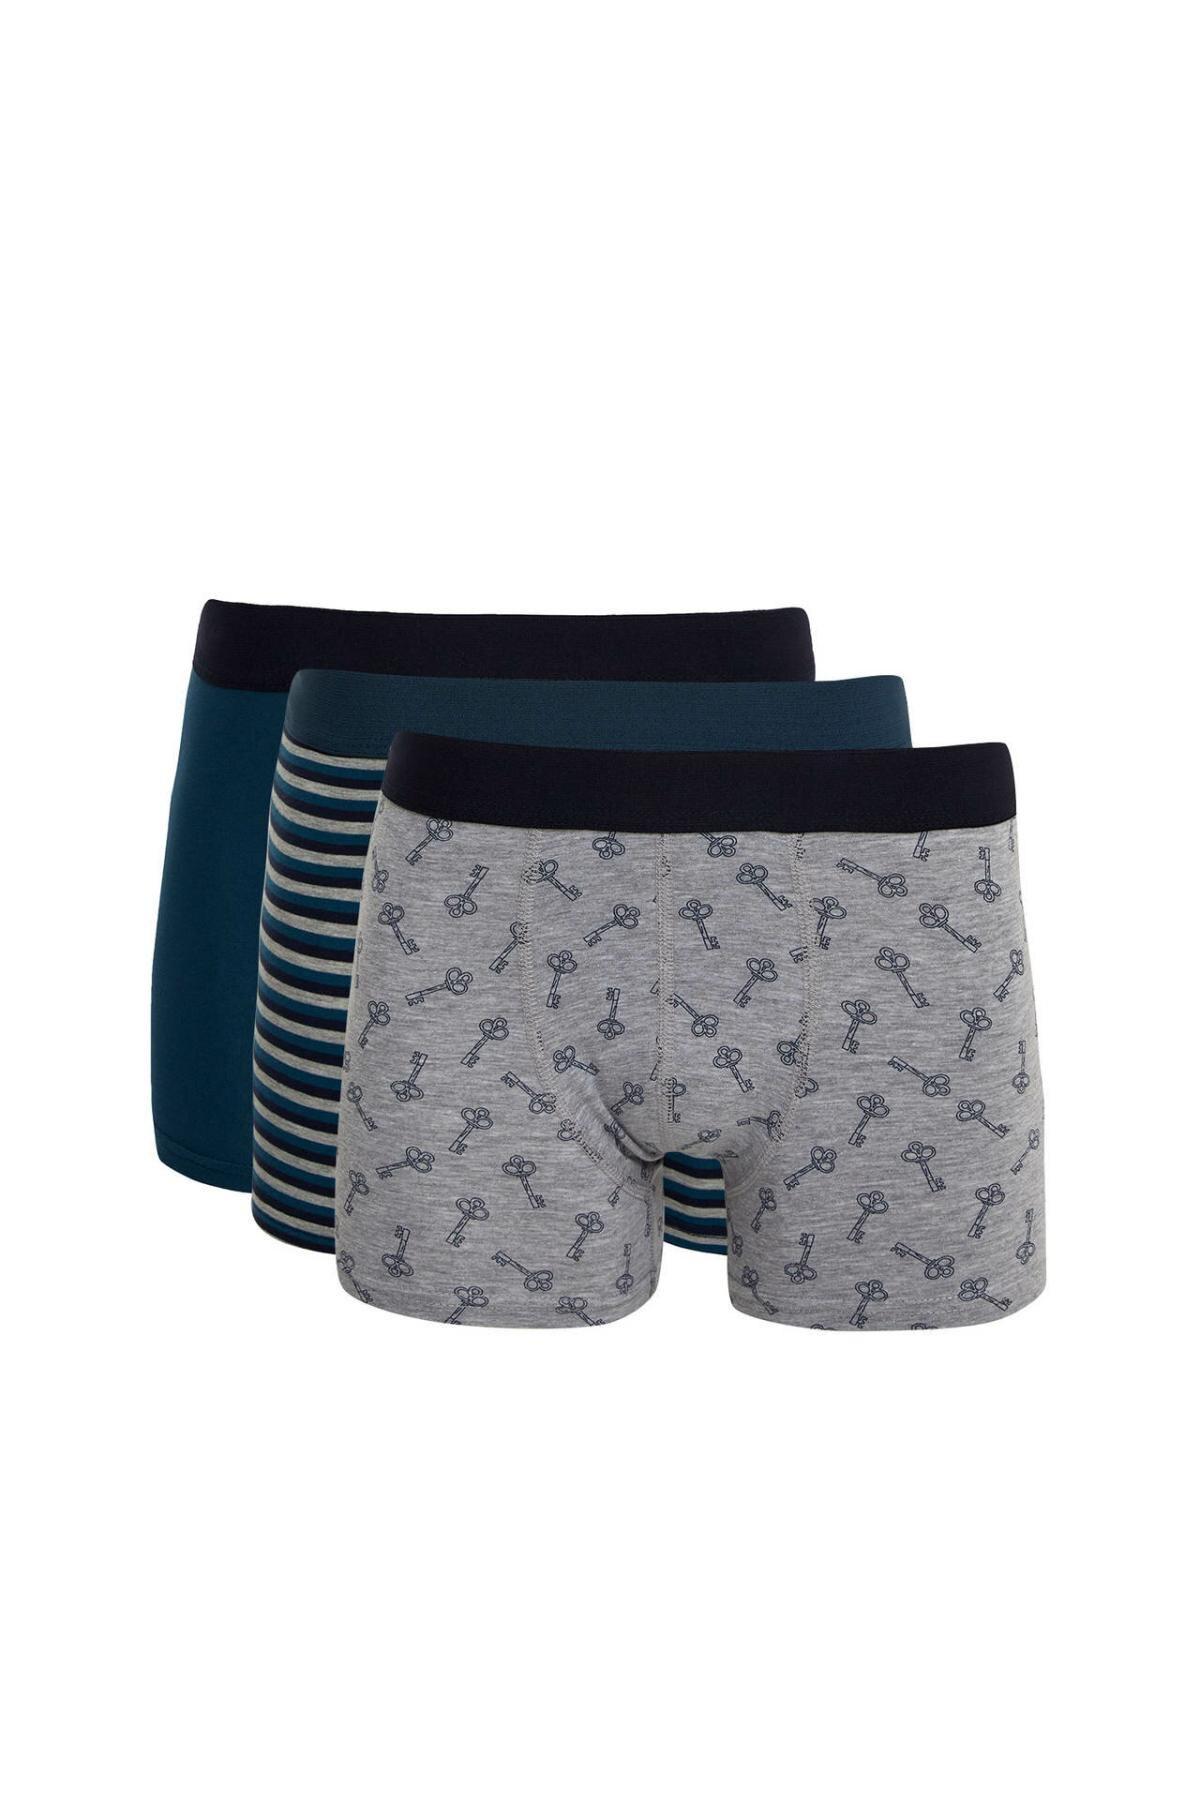 DeFacto Man Knitted Boxer-K6351AZ19SP